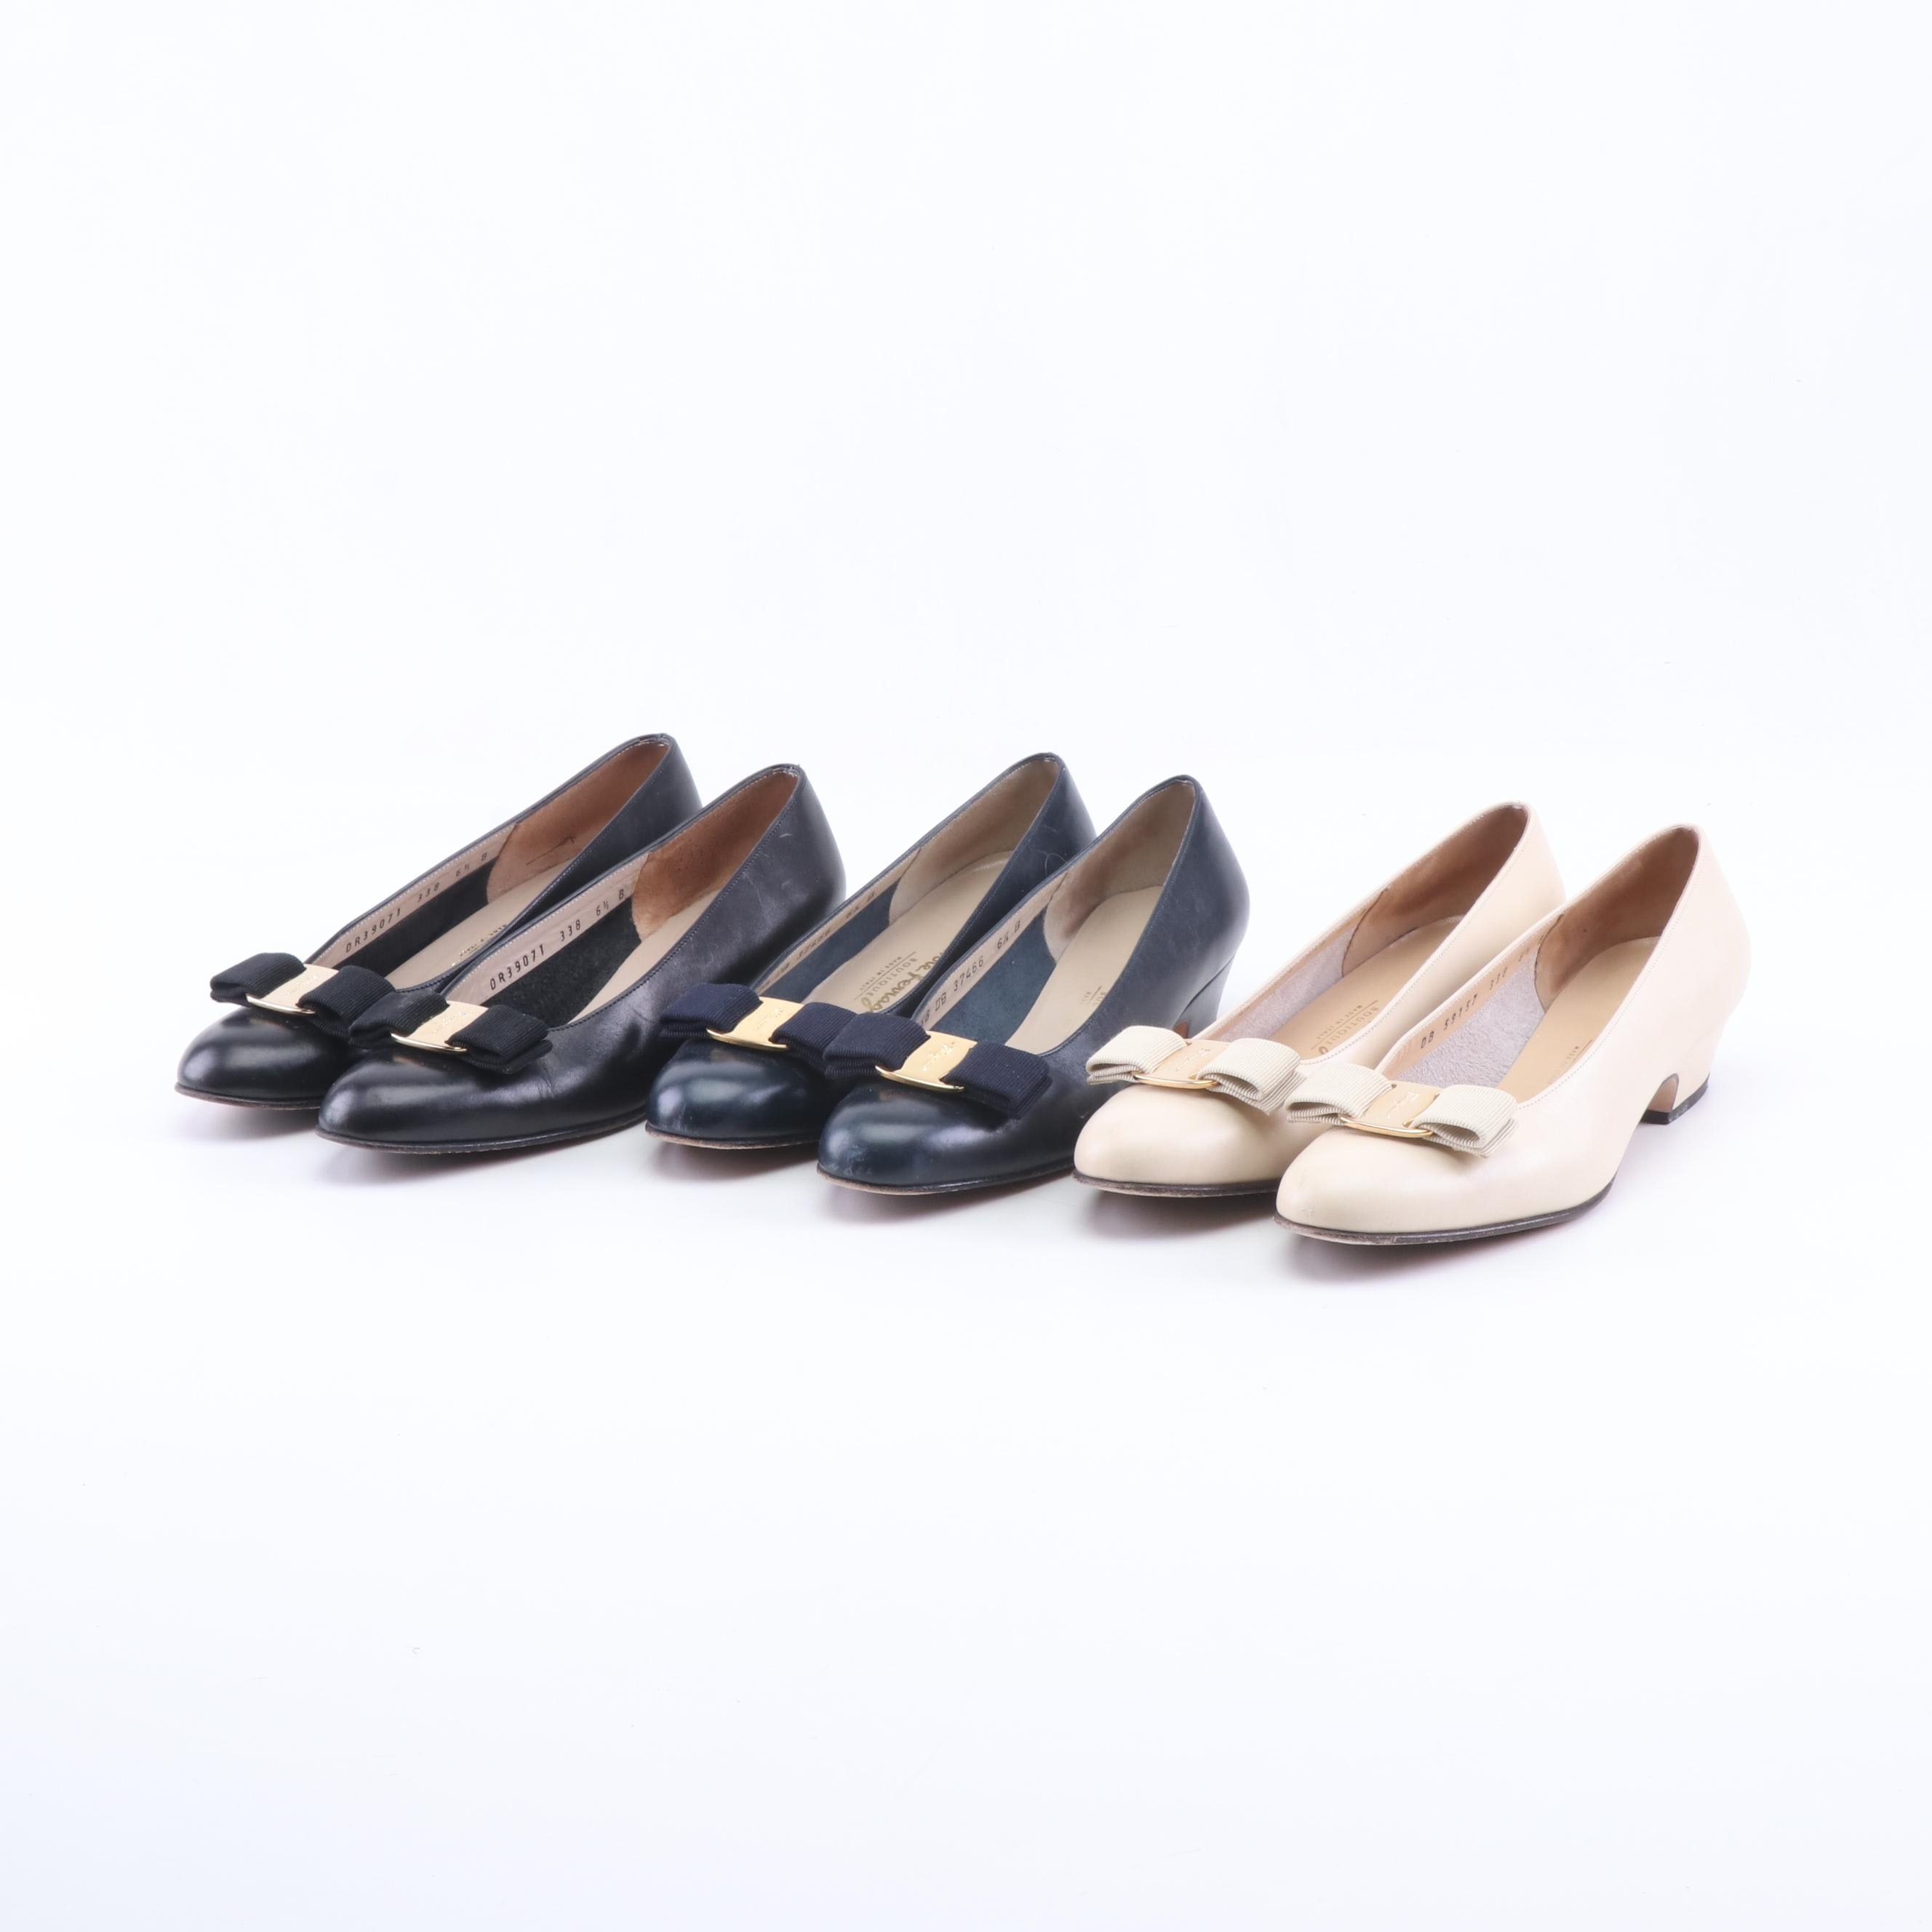 Three Pairs of Women's Salvatore Ferragamo Lillaz Leather Bow Pumps